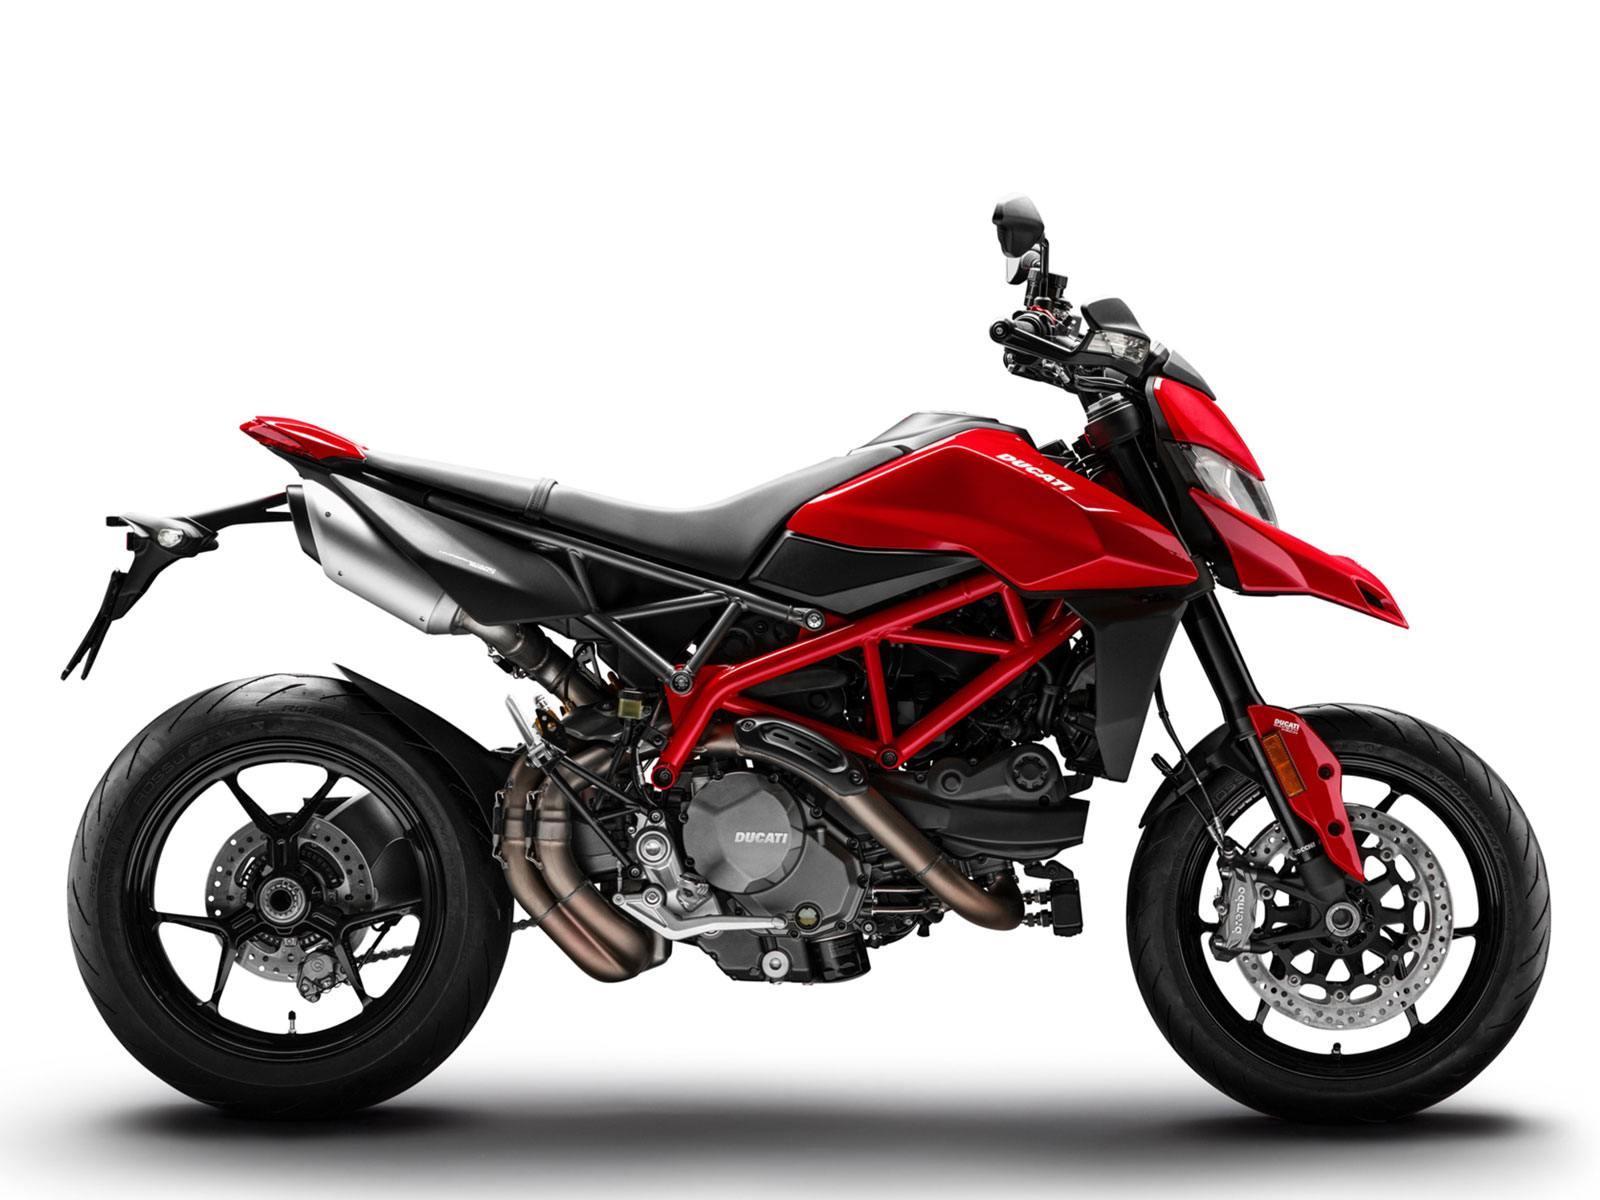 Мотоцикл DUCATI Hypermotard 950 - Ducati Red (2019)